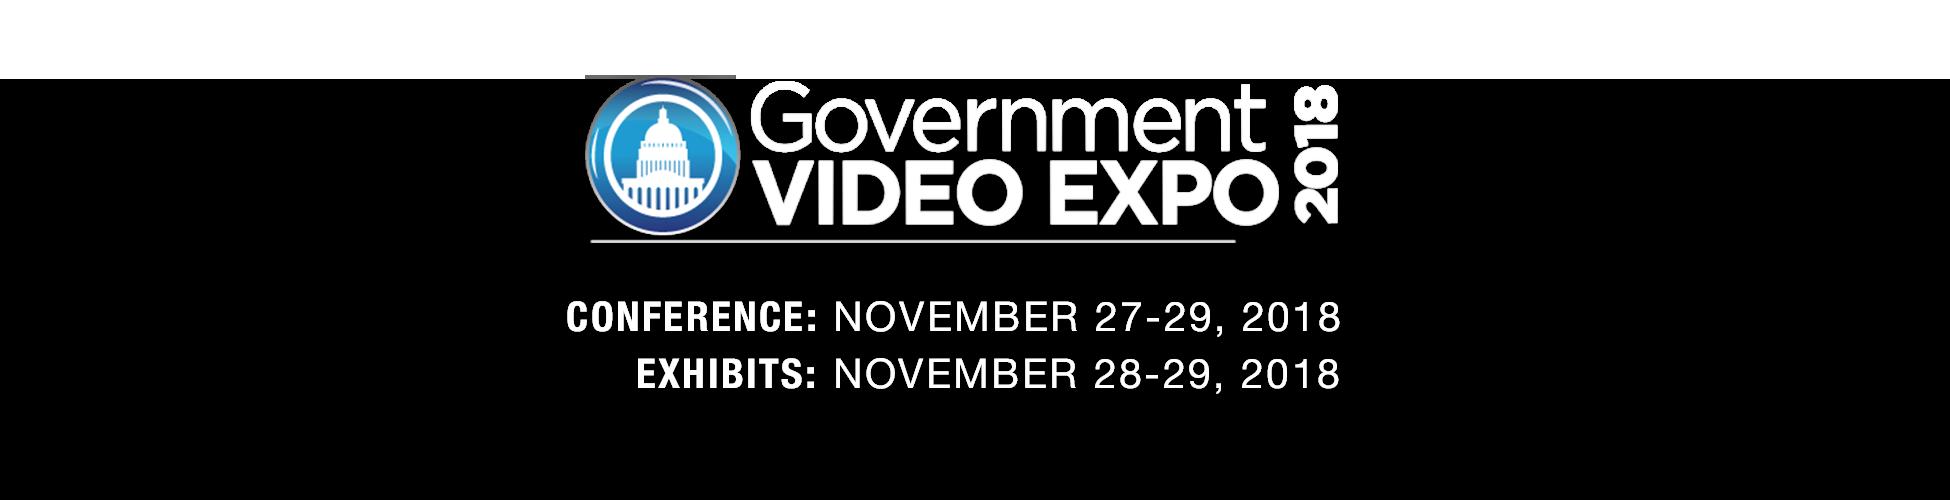 GV Expo 2018, Conference: November 27-29, 2018, Exhibits: November 28-29, 2018